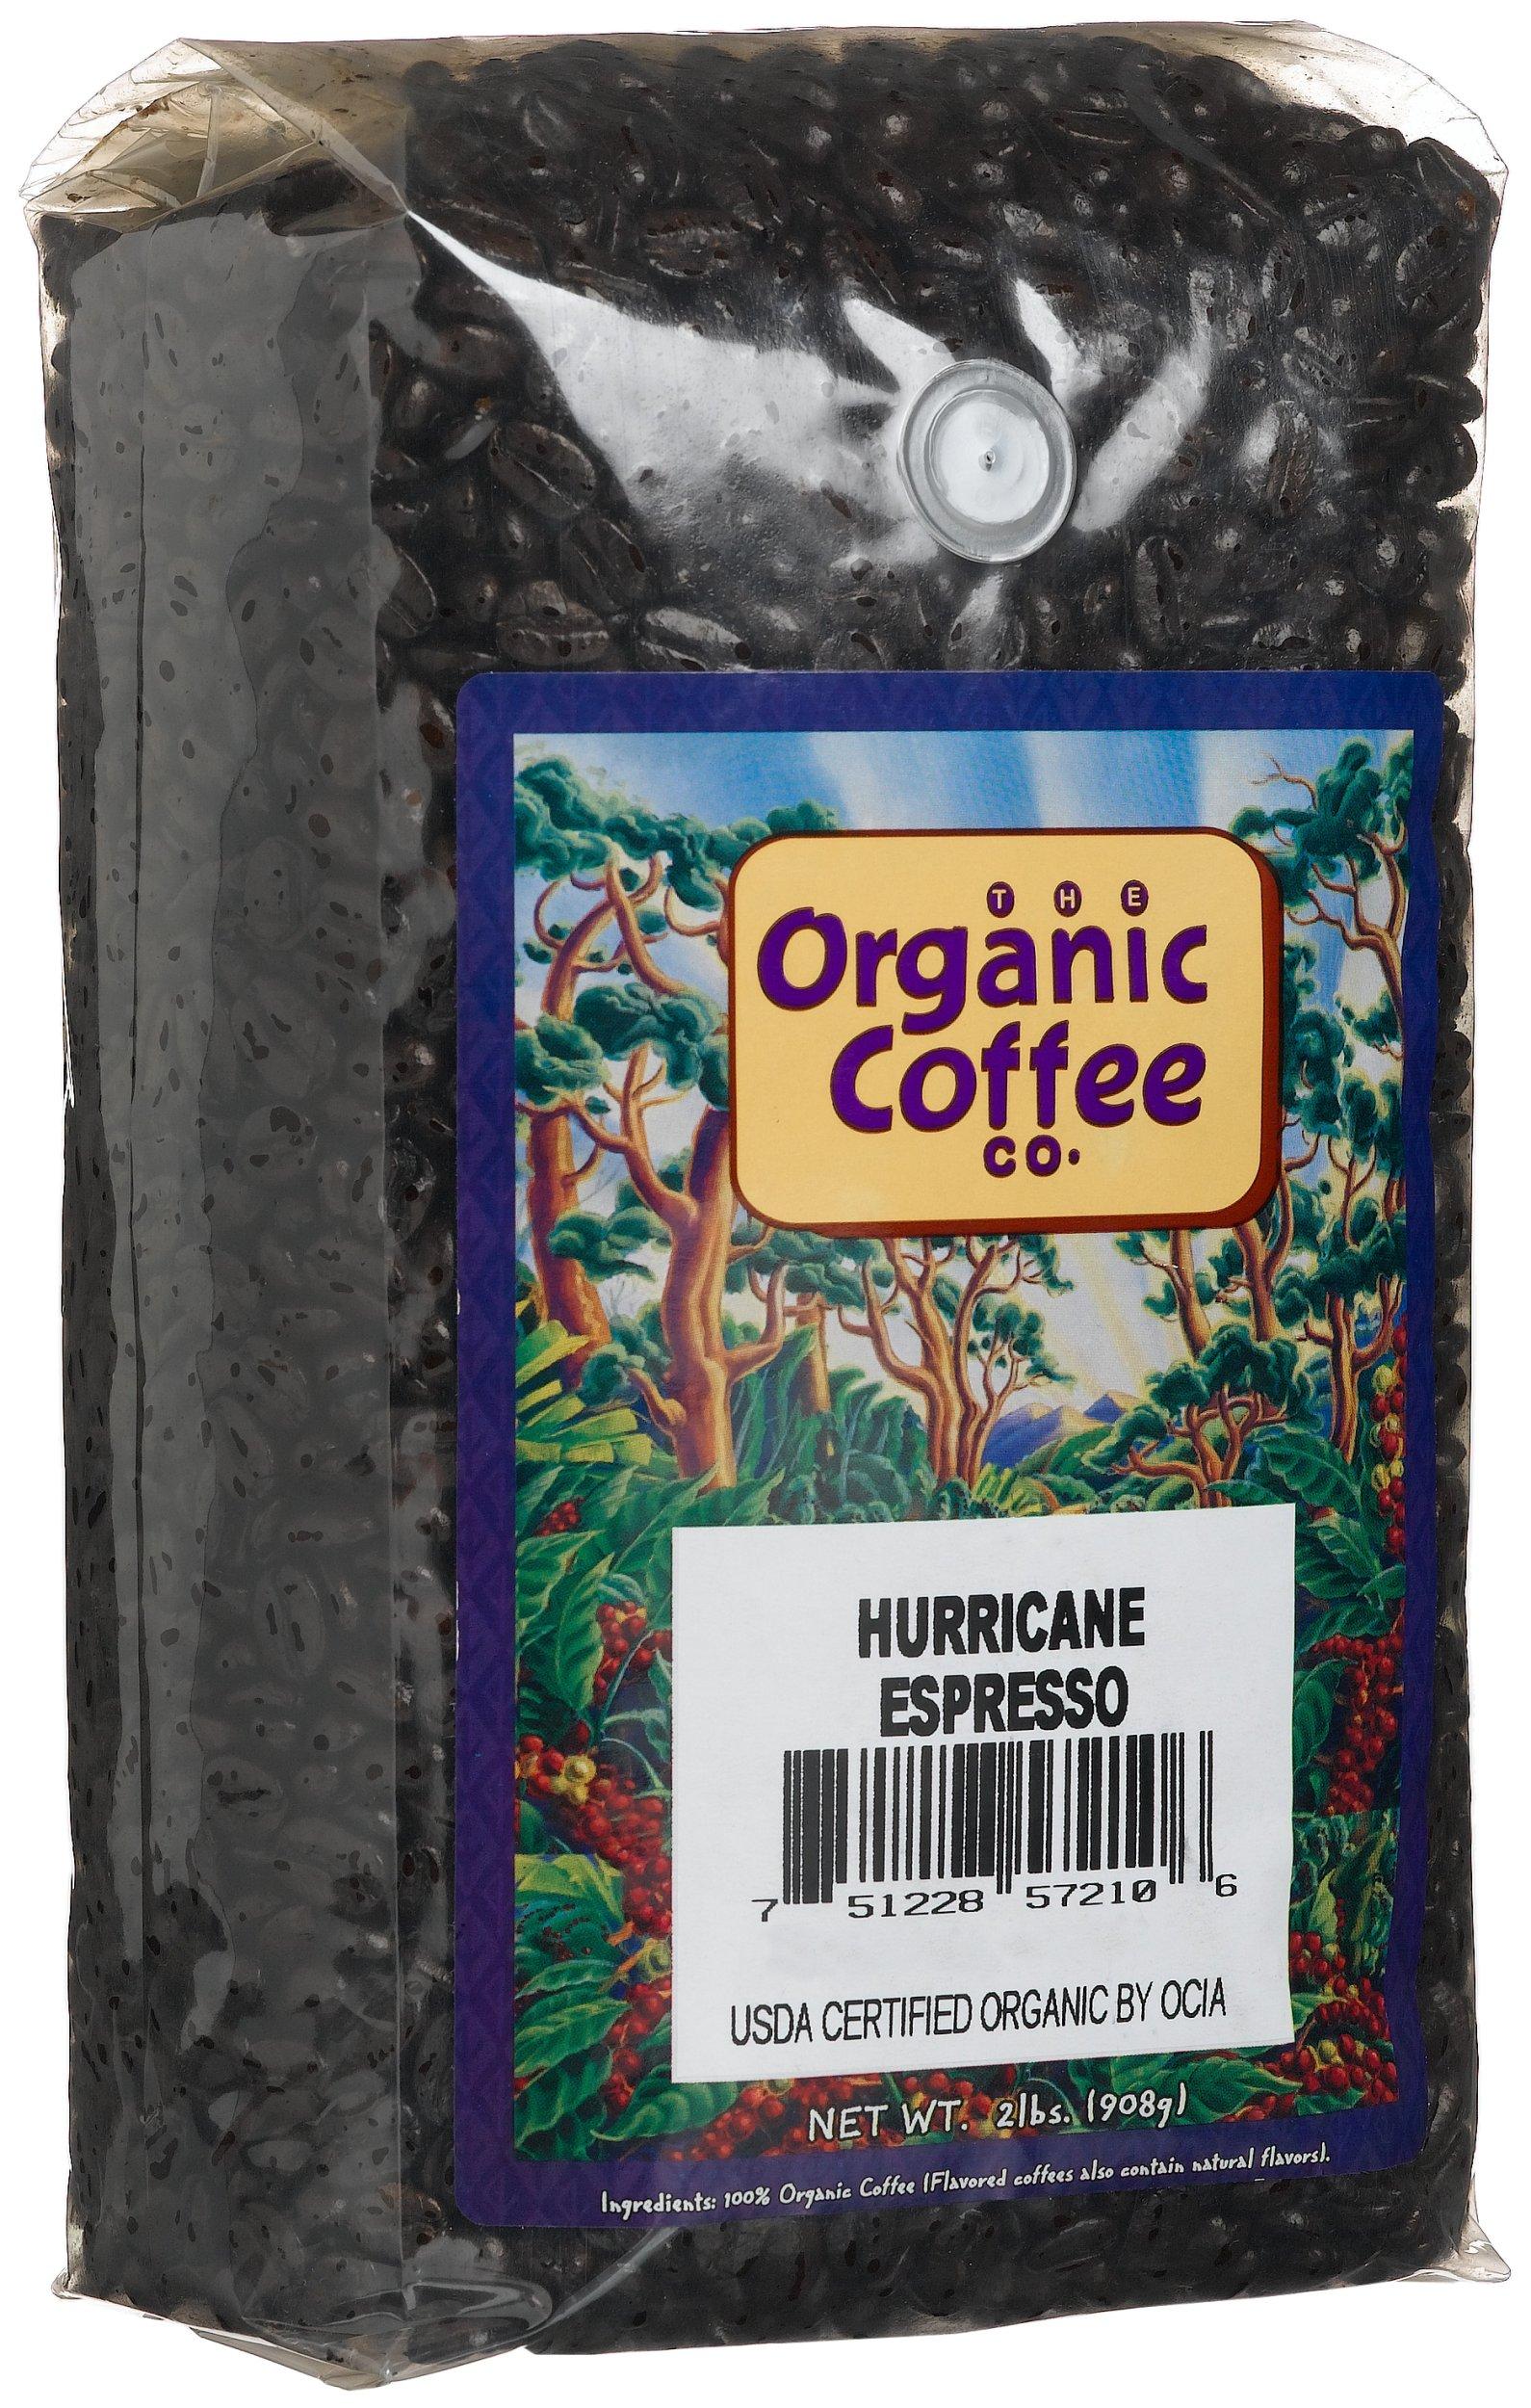 The Organic Coffee Co., Hurricane Espresso- Whole Bean, 2-Pound (32 oz.), USDA Organic